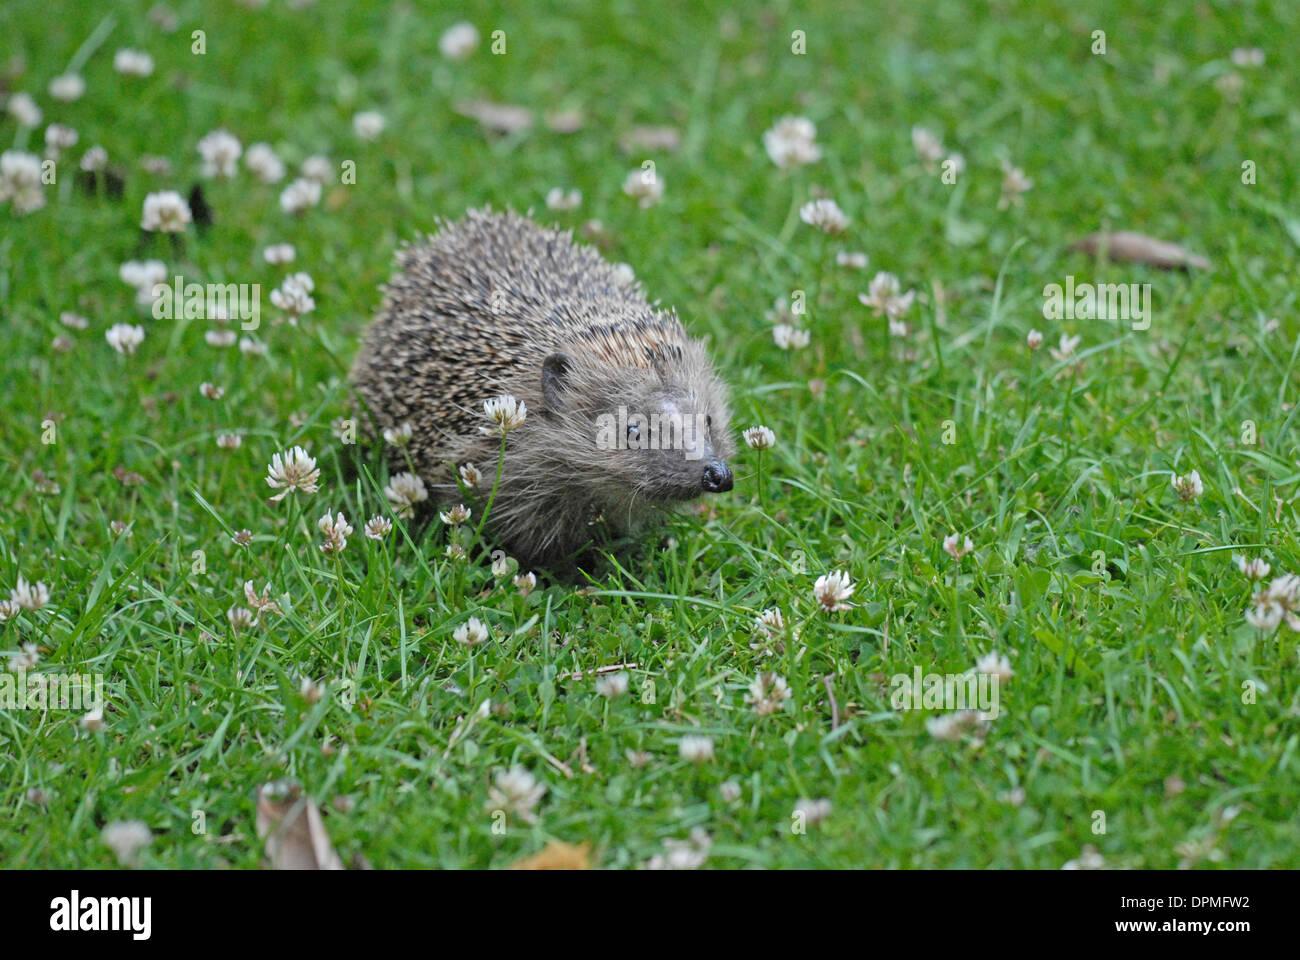 Hedgehog (Erinaceus europaeus) on a clover lawn. Stock Photo